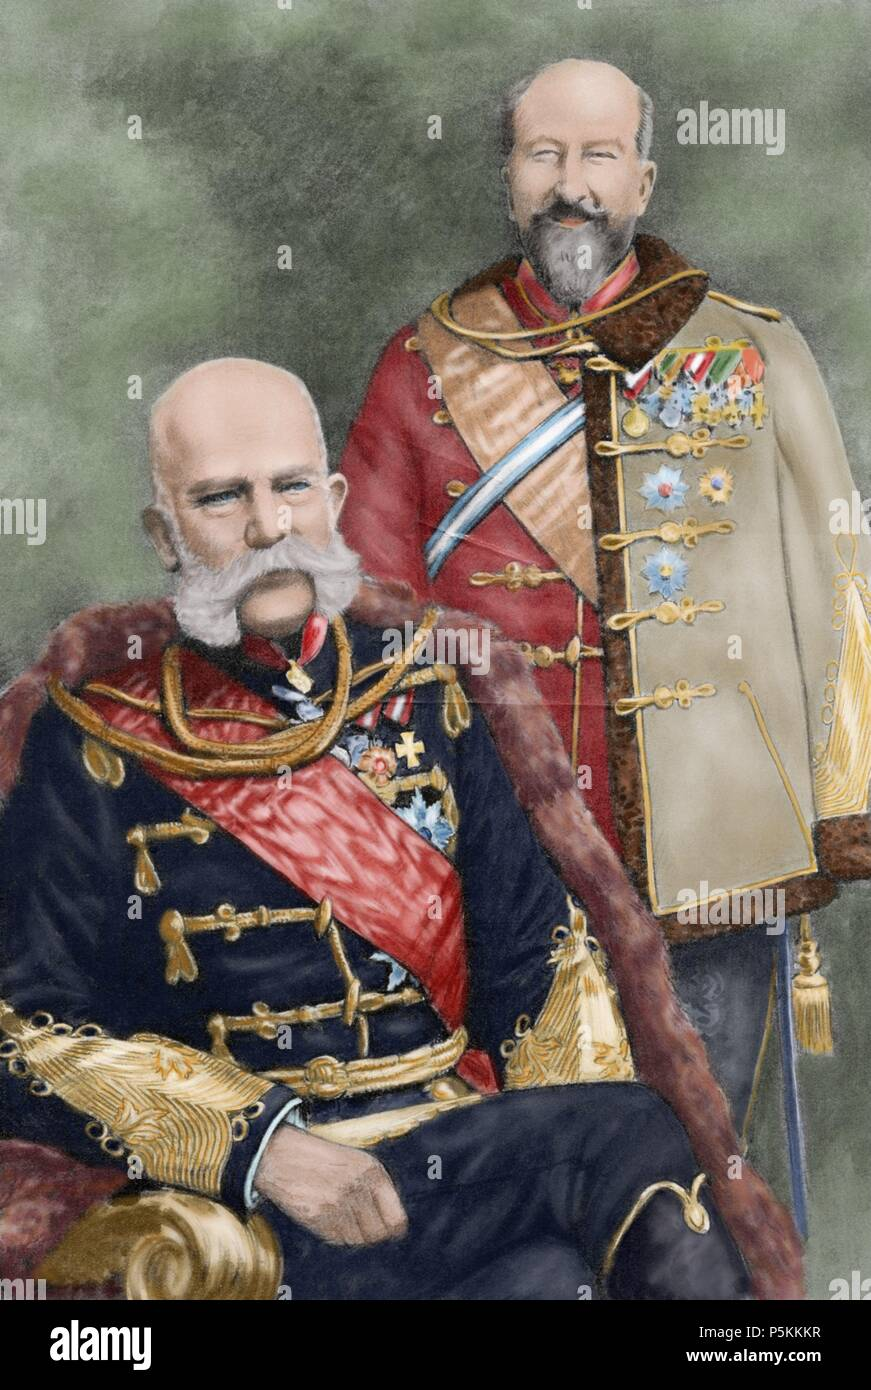 Franz Joseph I of Austria (1830-1916). Emperor of Austria and King of Hungary and Ferdinand I of Austria (1861-1948).  Emperor of Austria. Photograph, 1908. Colored. - Stock Image